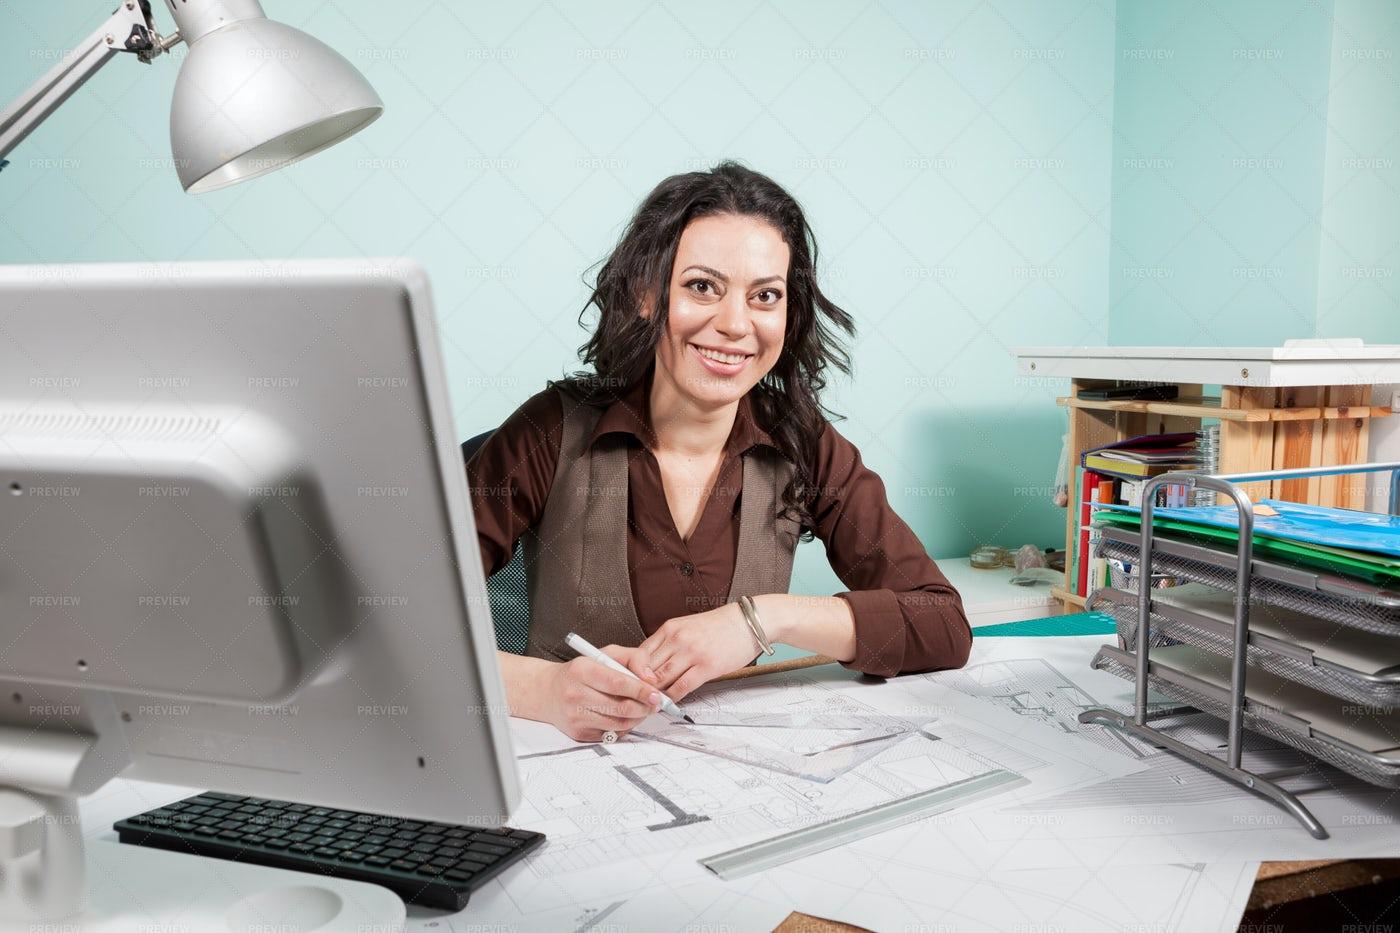 Portrait Of A Smiling Architect: Stock Photos